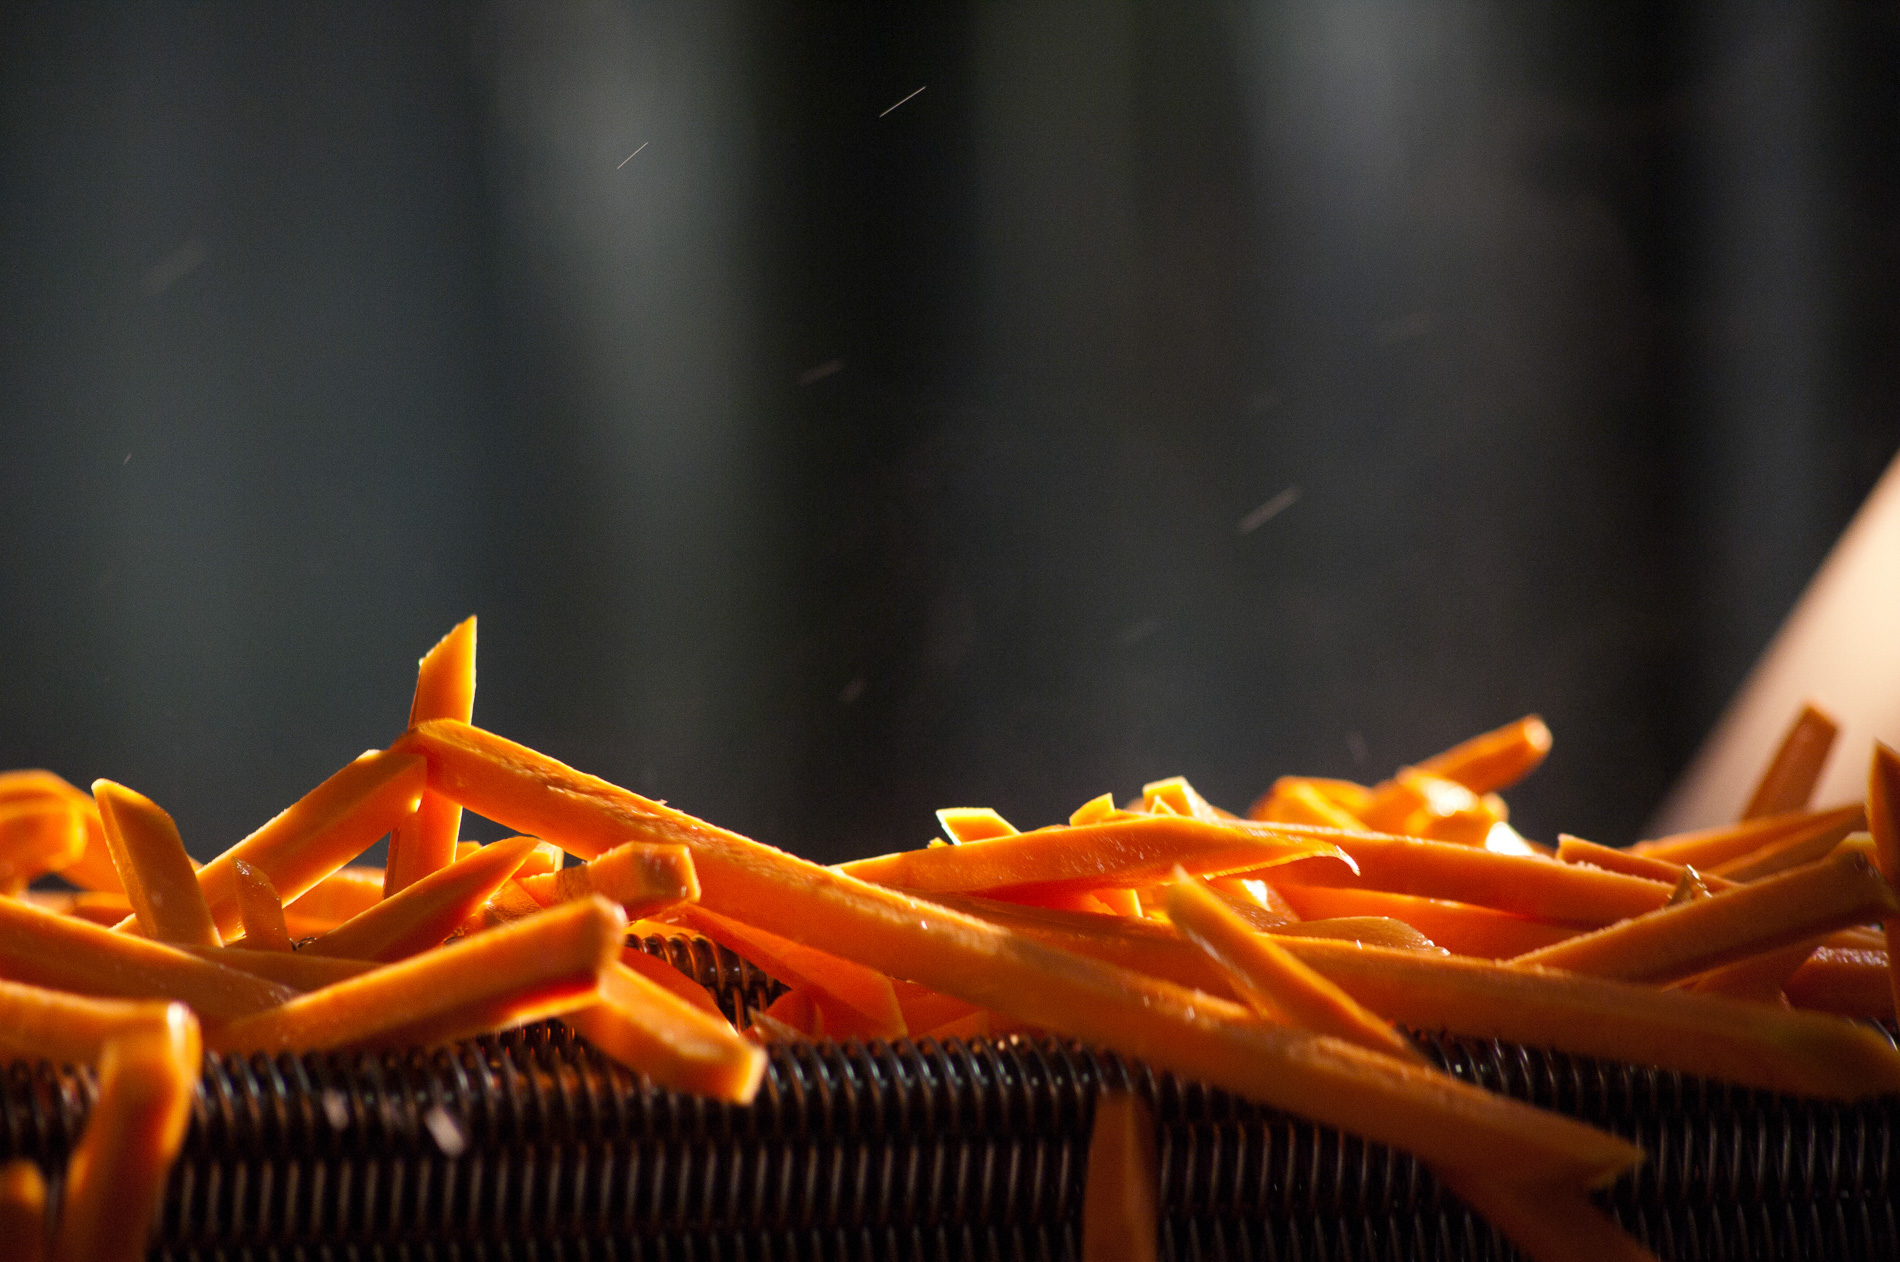 Sweet Potato Fry Production